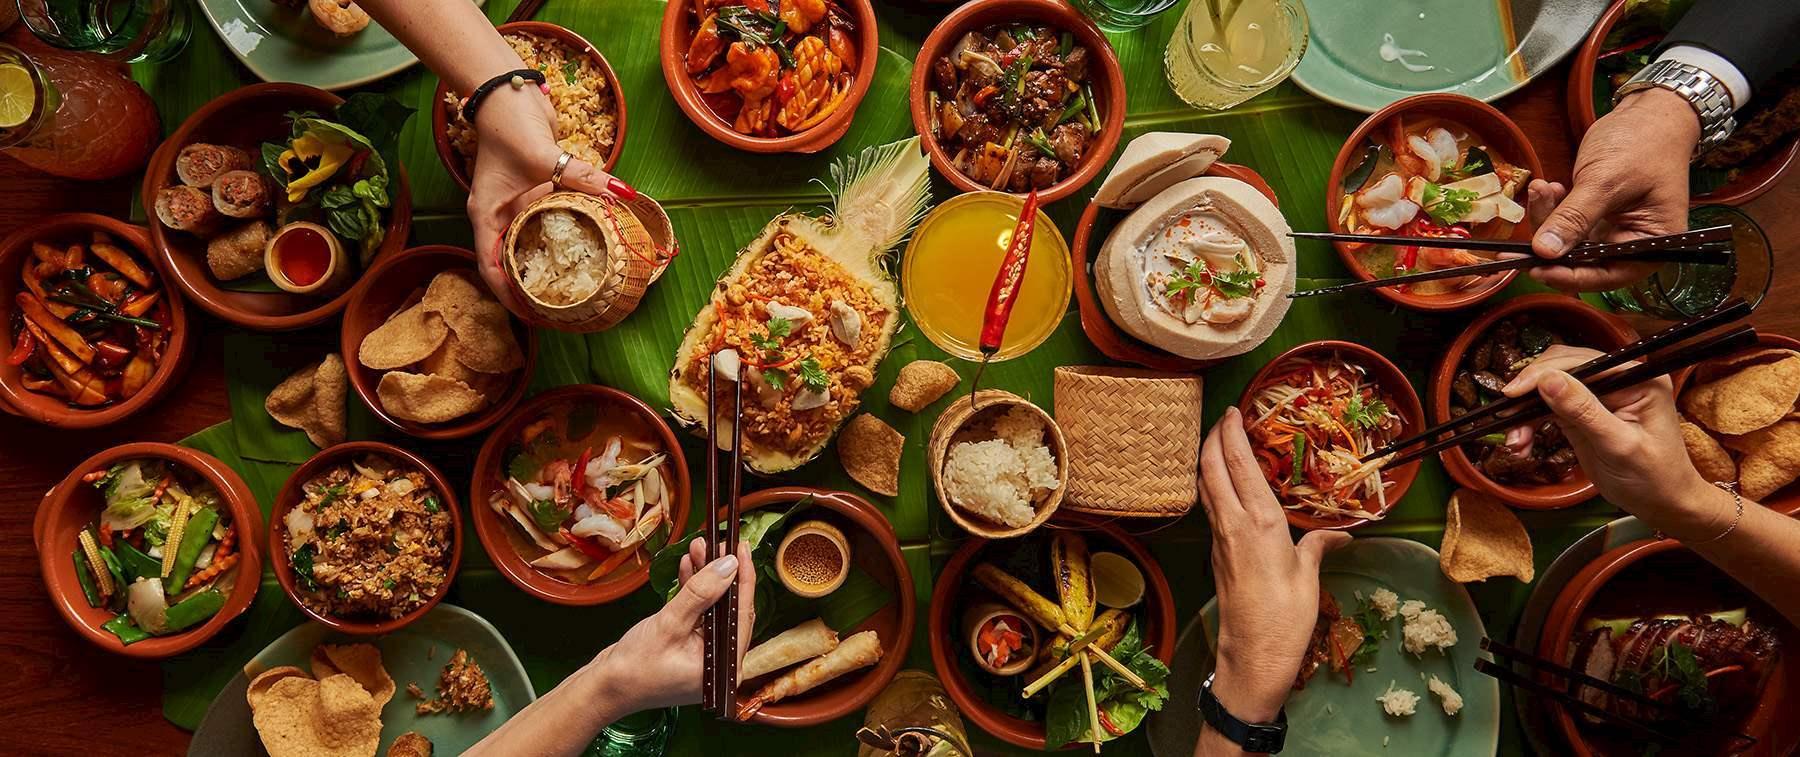 Spice Emporium Dubai Thai Cuisine The Westin Dubai Mina Seyahi